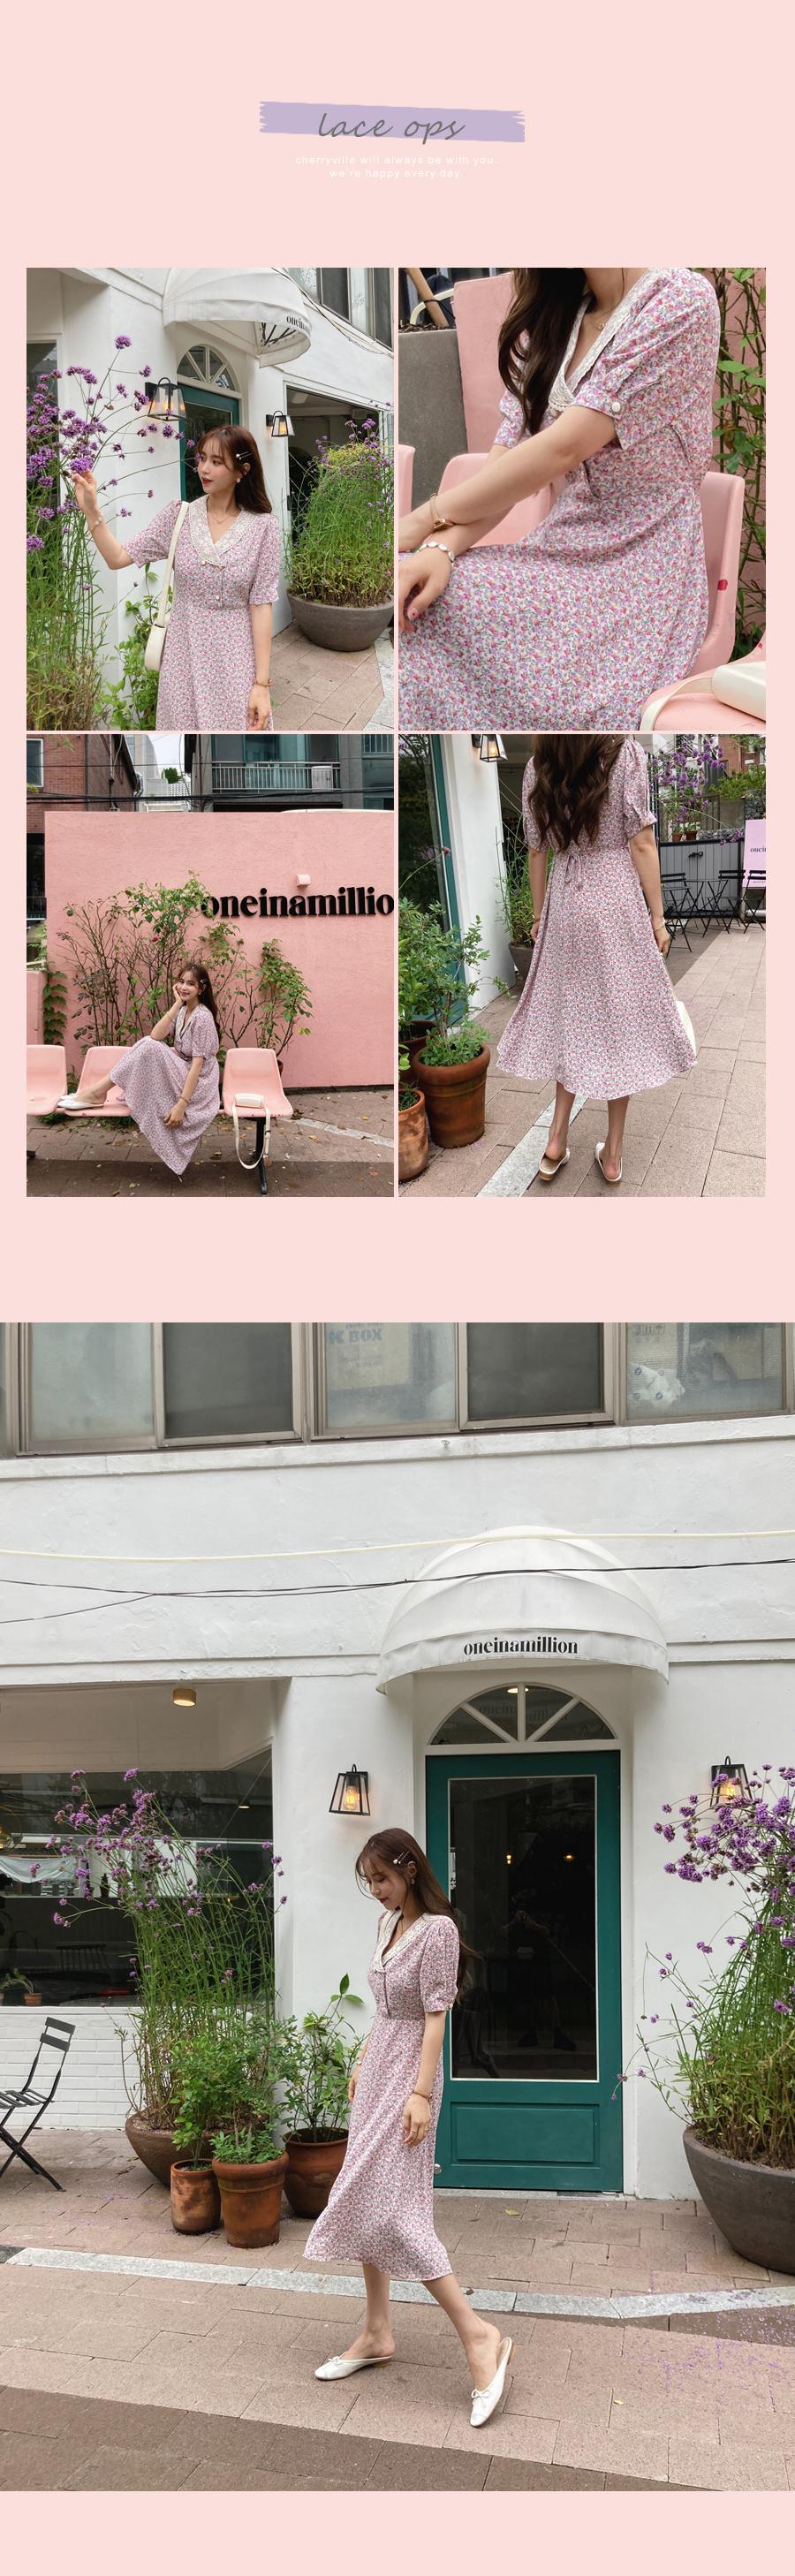 Shining flower lace dress